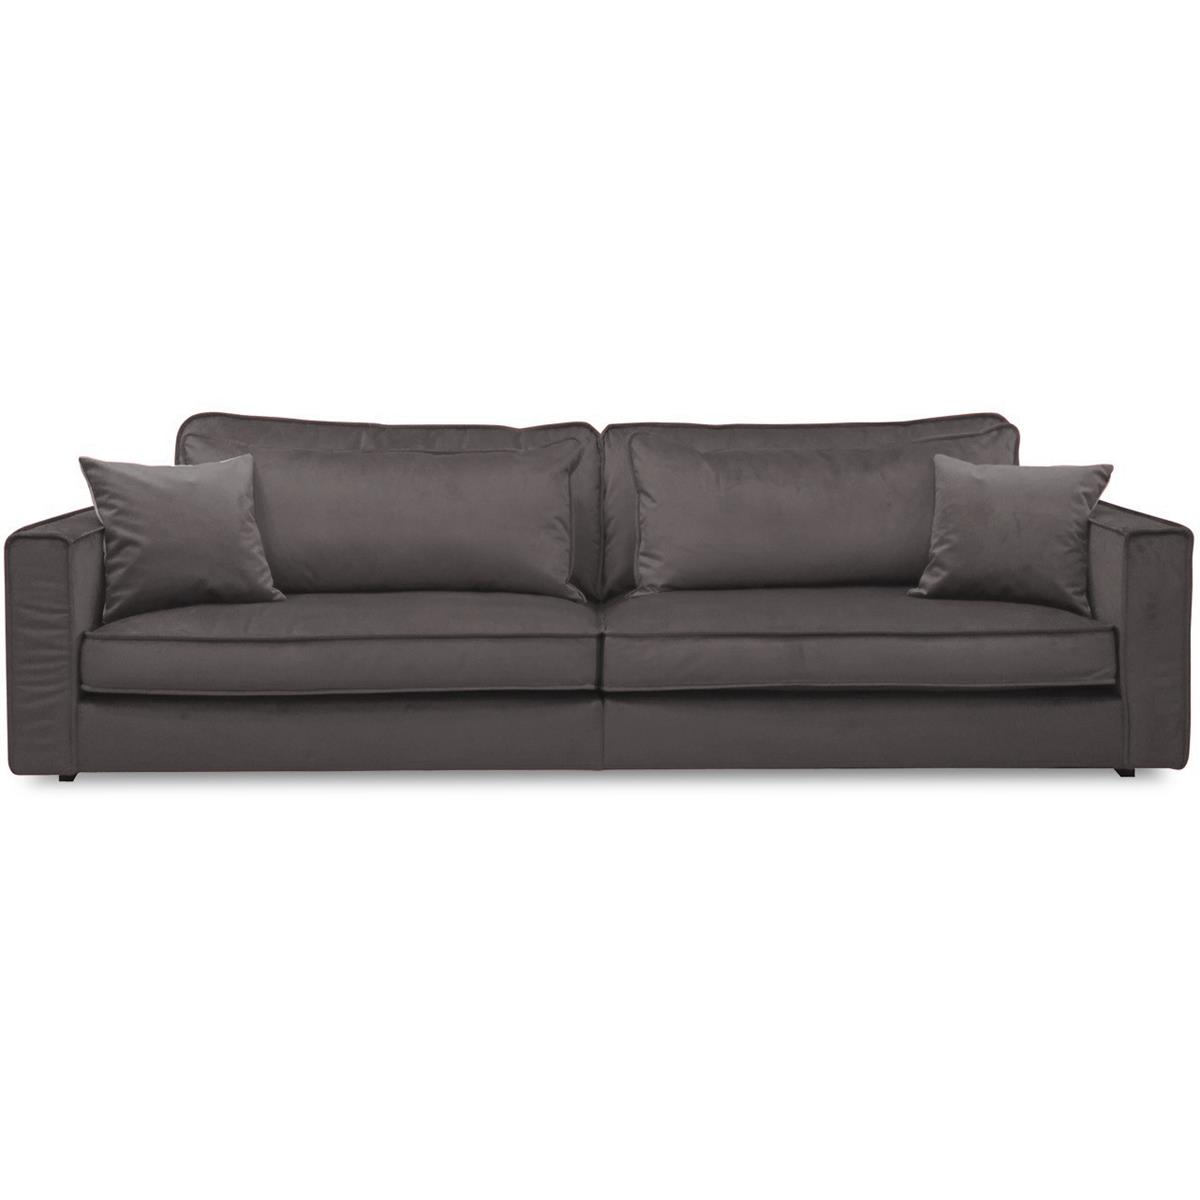 Luca-iron-soffa-fasta-ryggkuddar